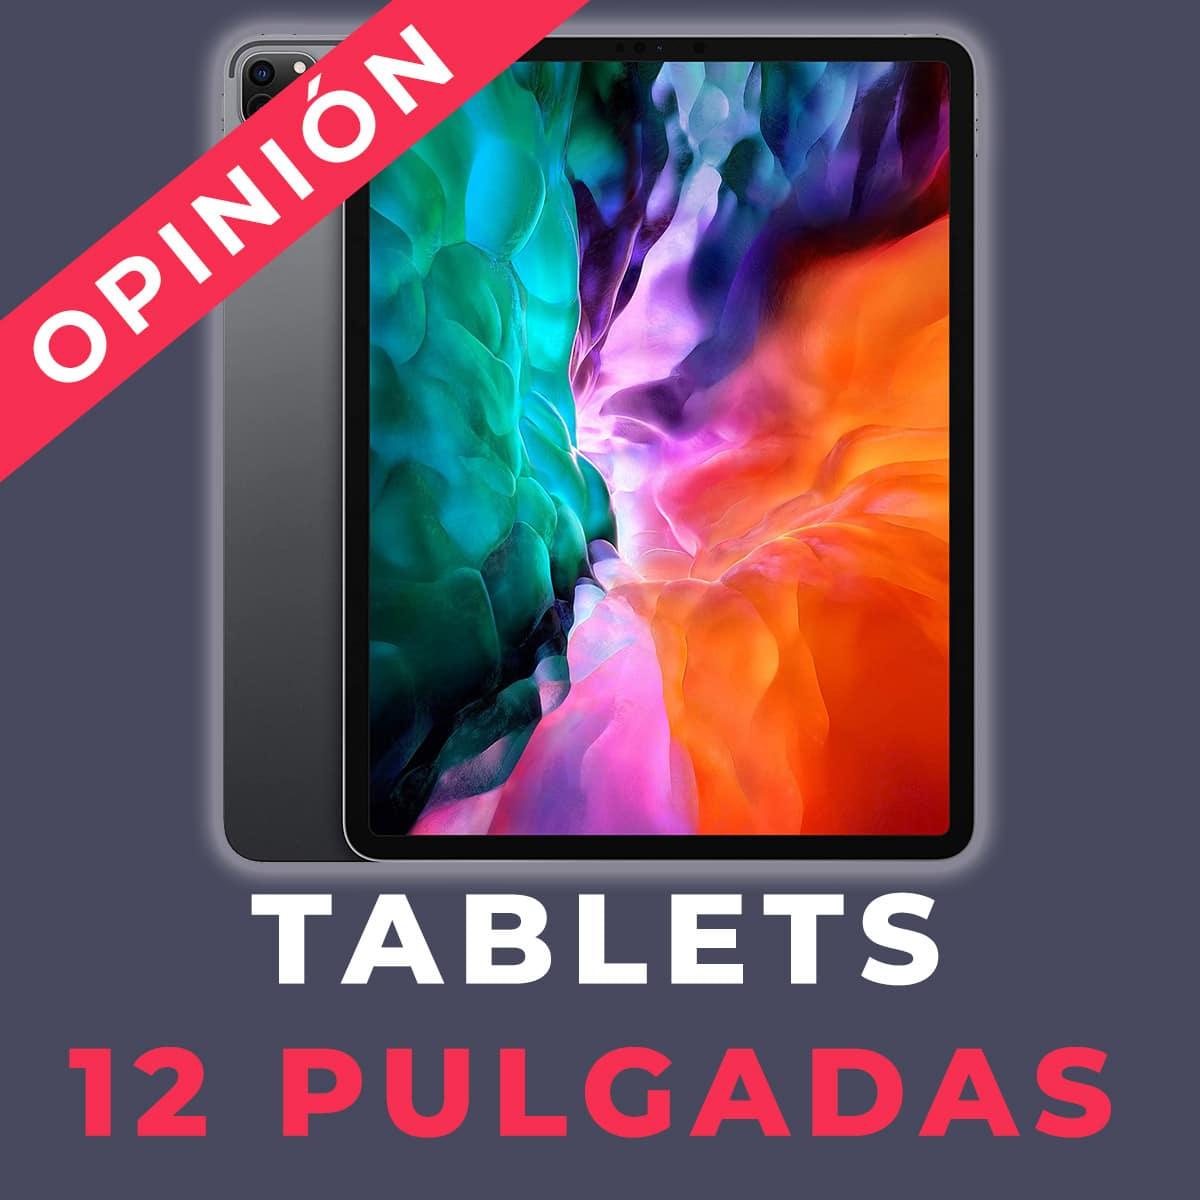 tablet 12 pulgadas